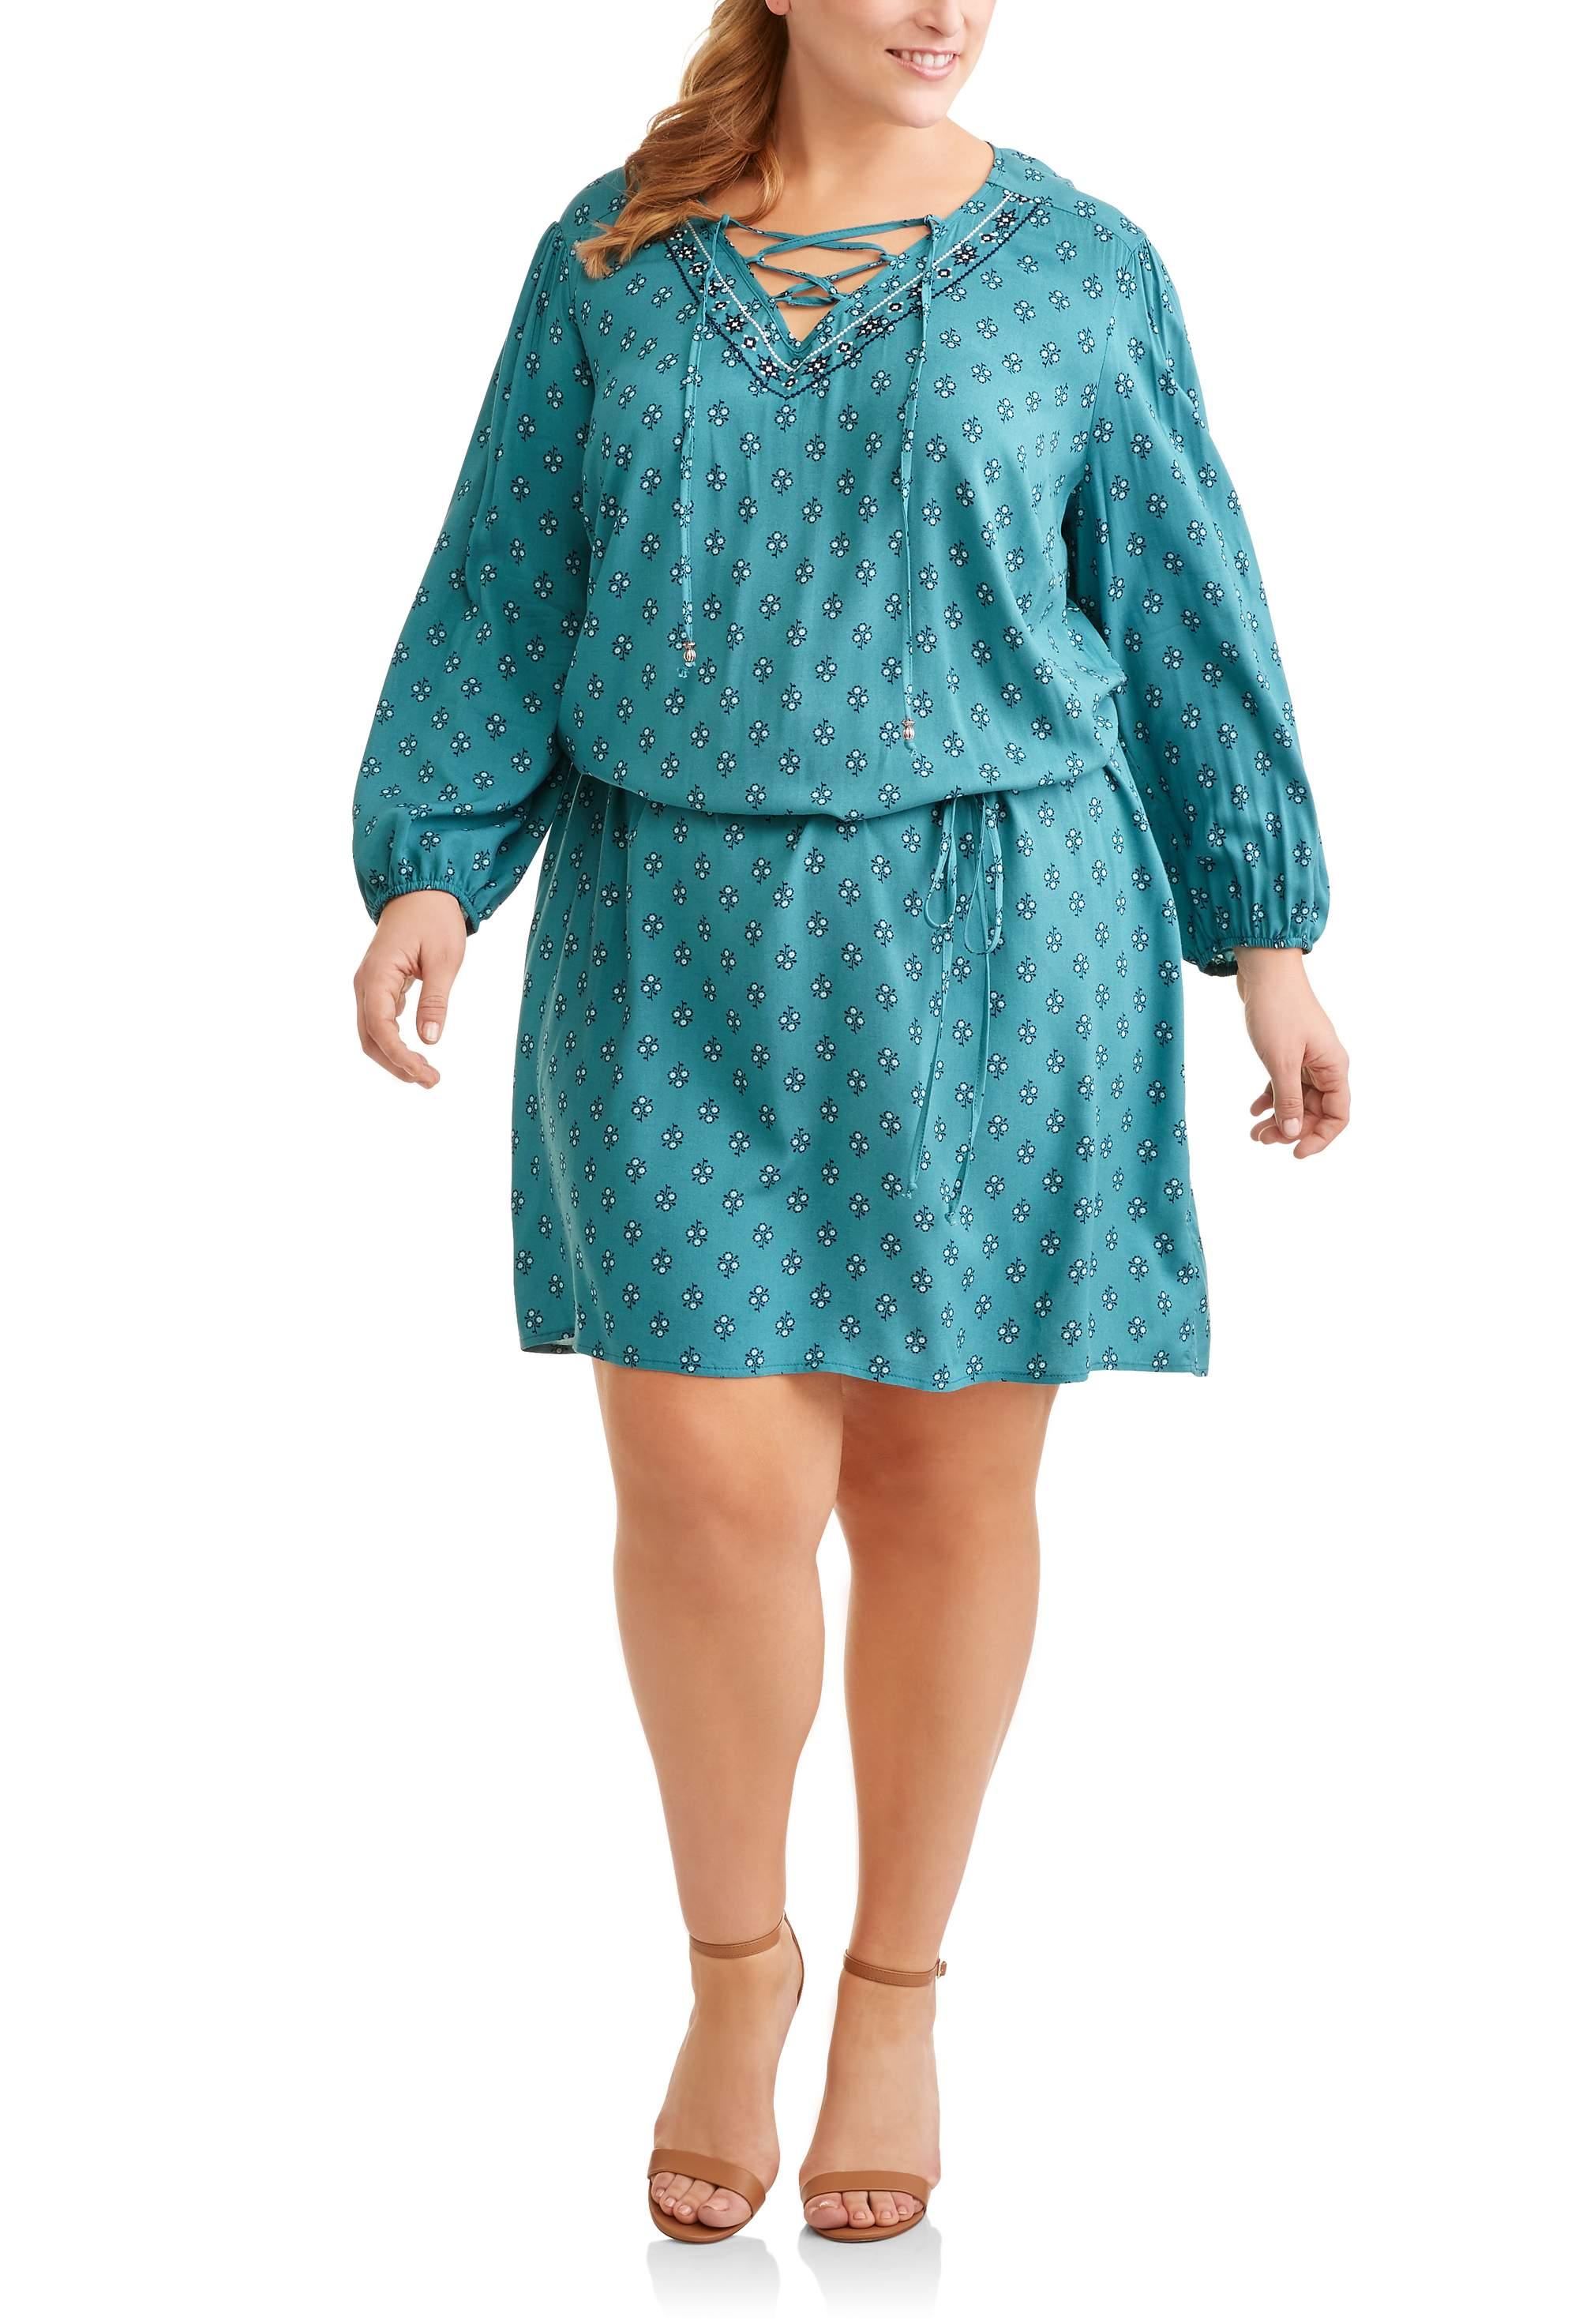 Terra & Sky Women's Plus Woven Lace Up Peasant Dress